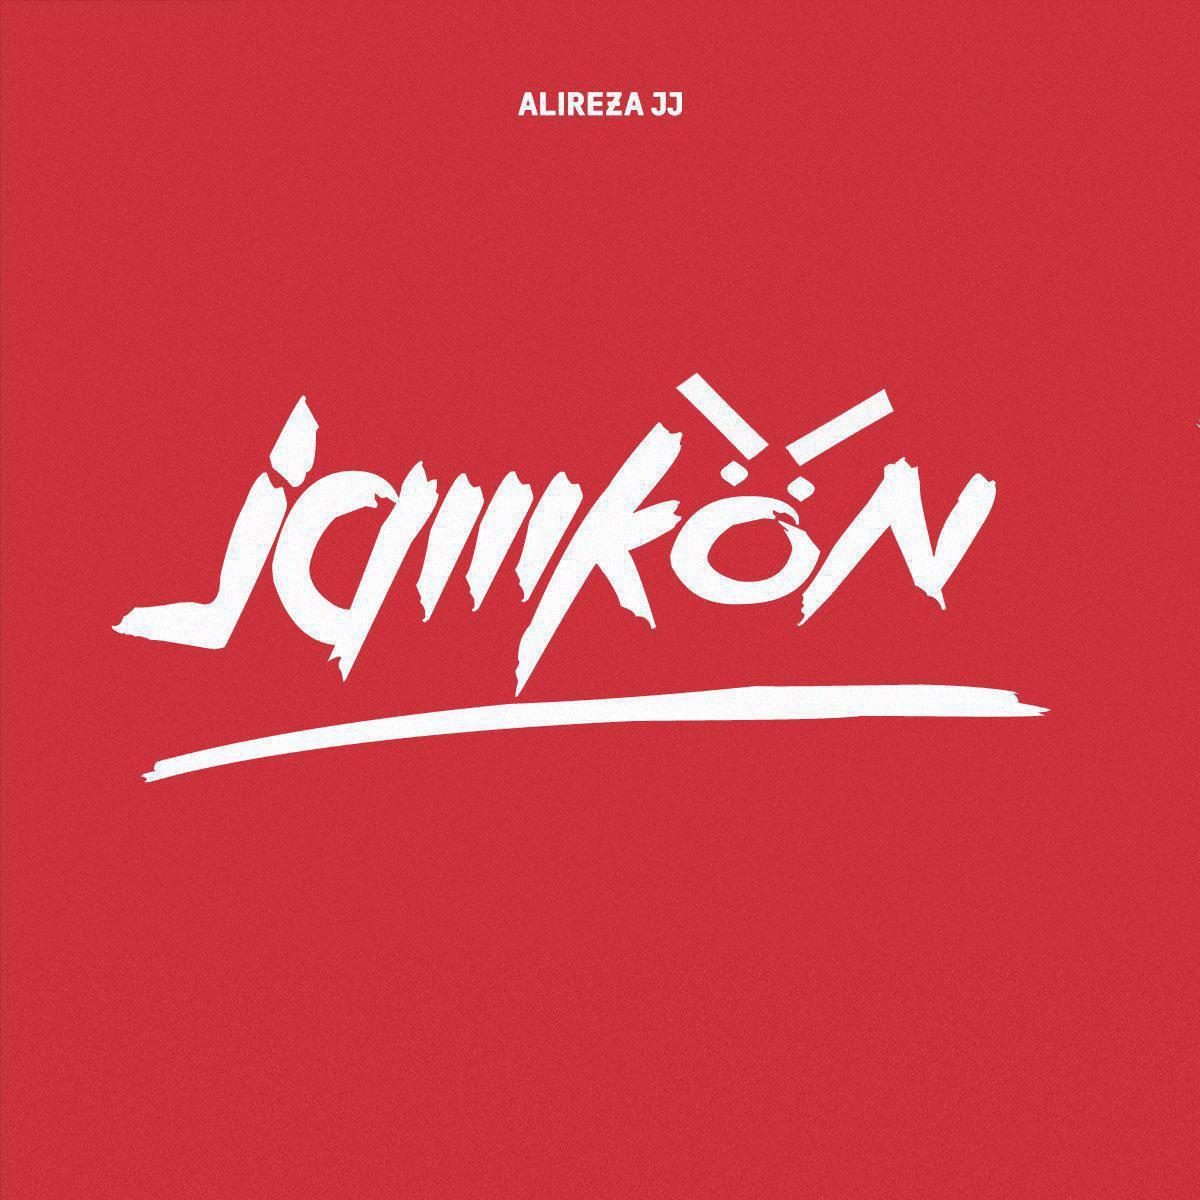 Alireza JJ – Jam Kon